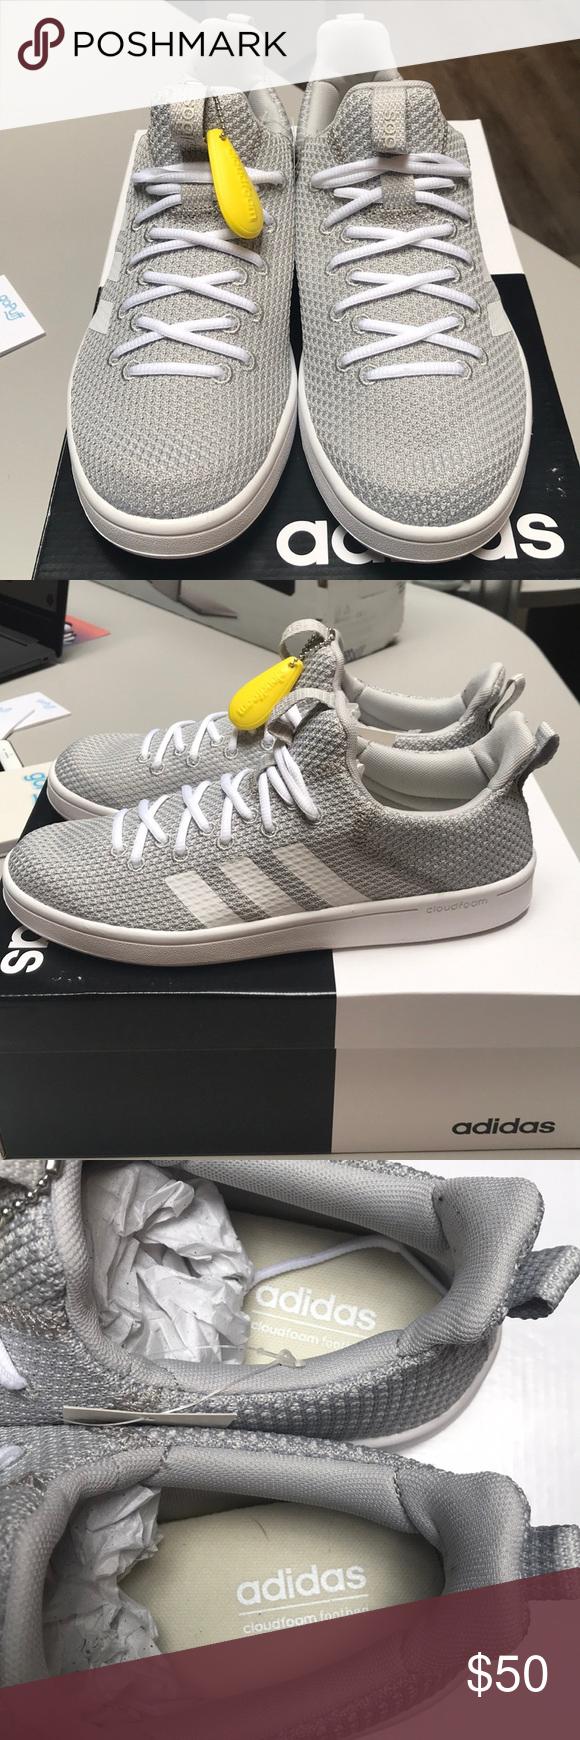 1deec80d202 Adidas Cloudfoam Advantage Adapt - Womens Size 8.5. Grey Cloud White ...